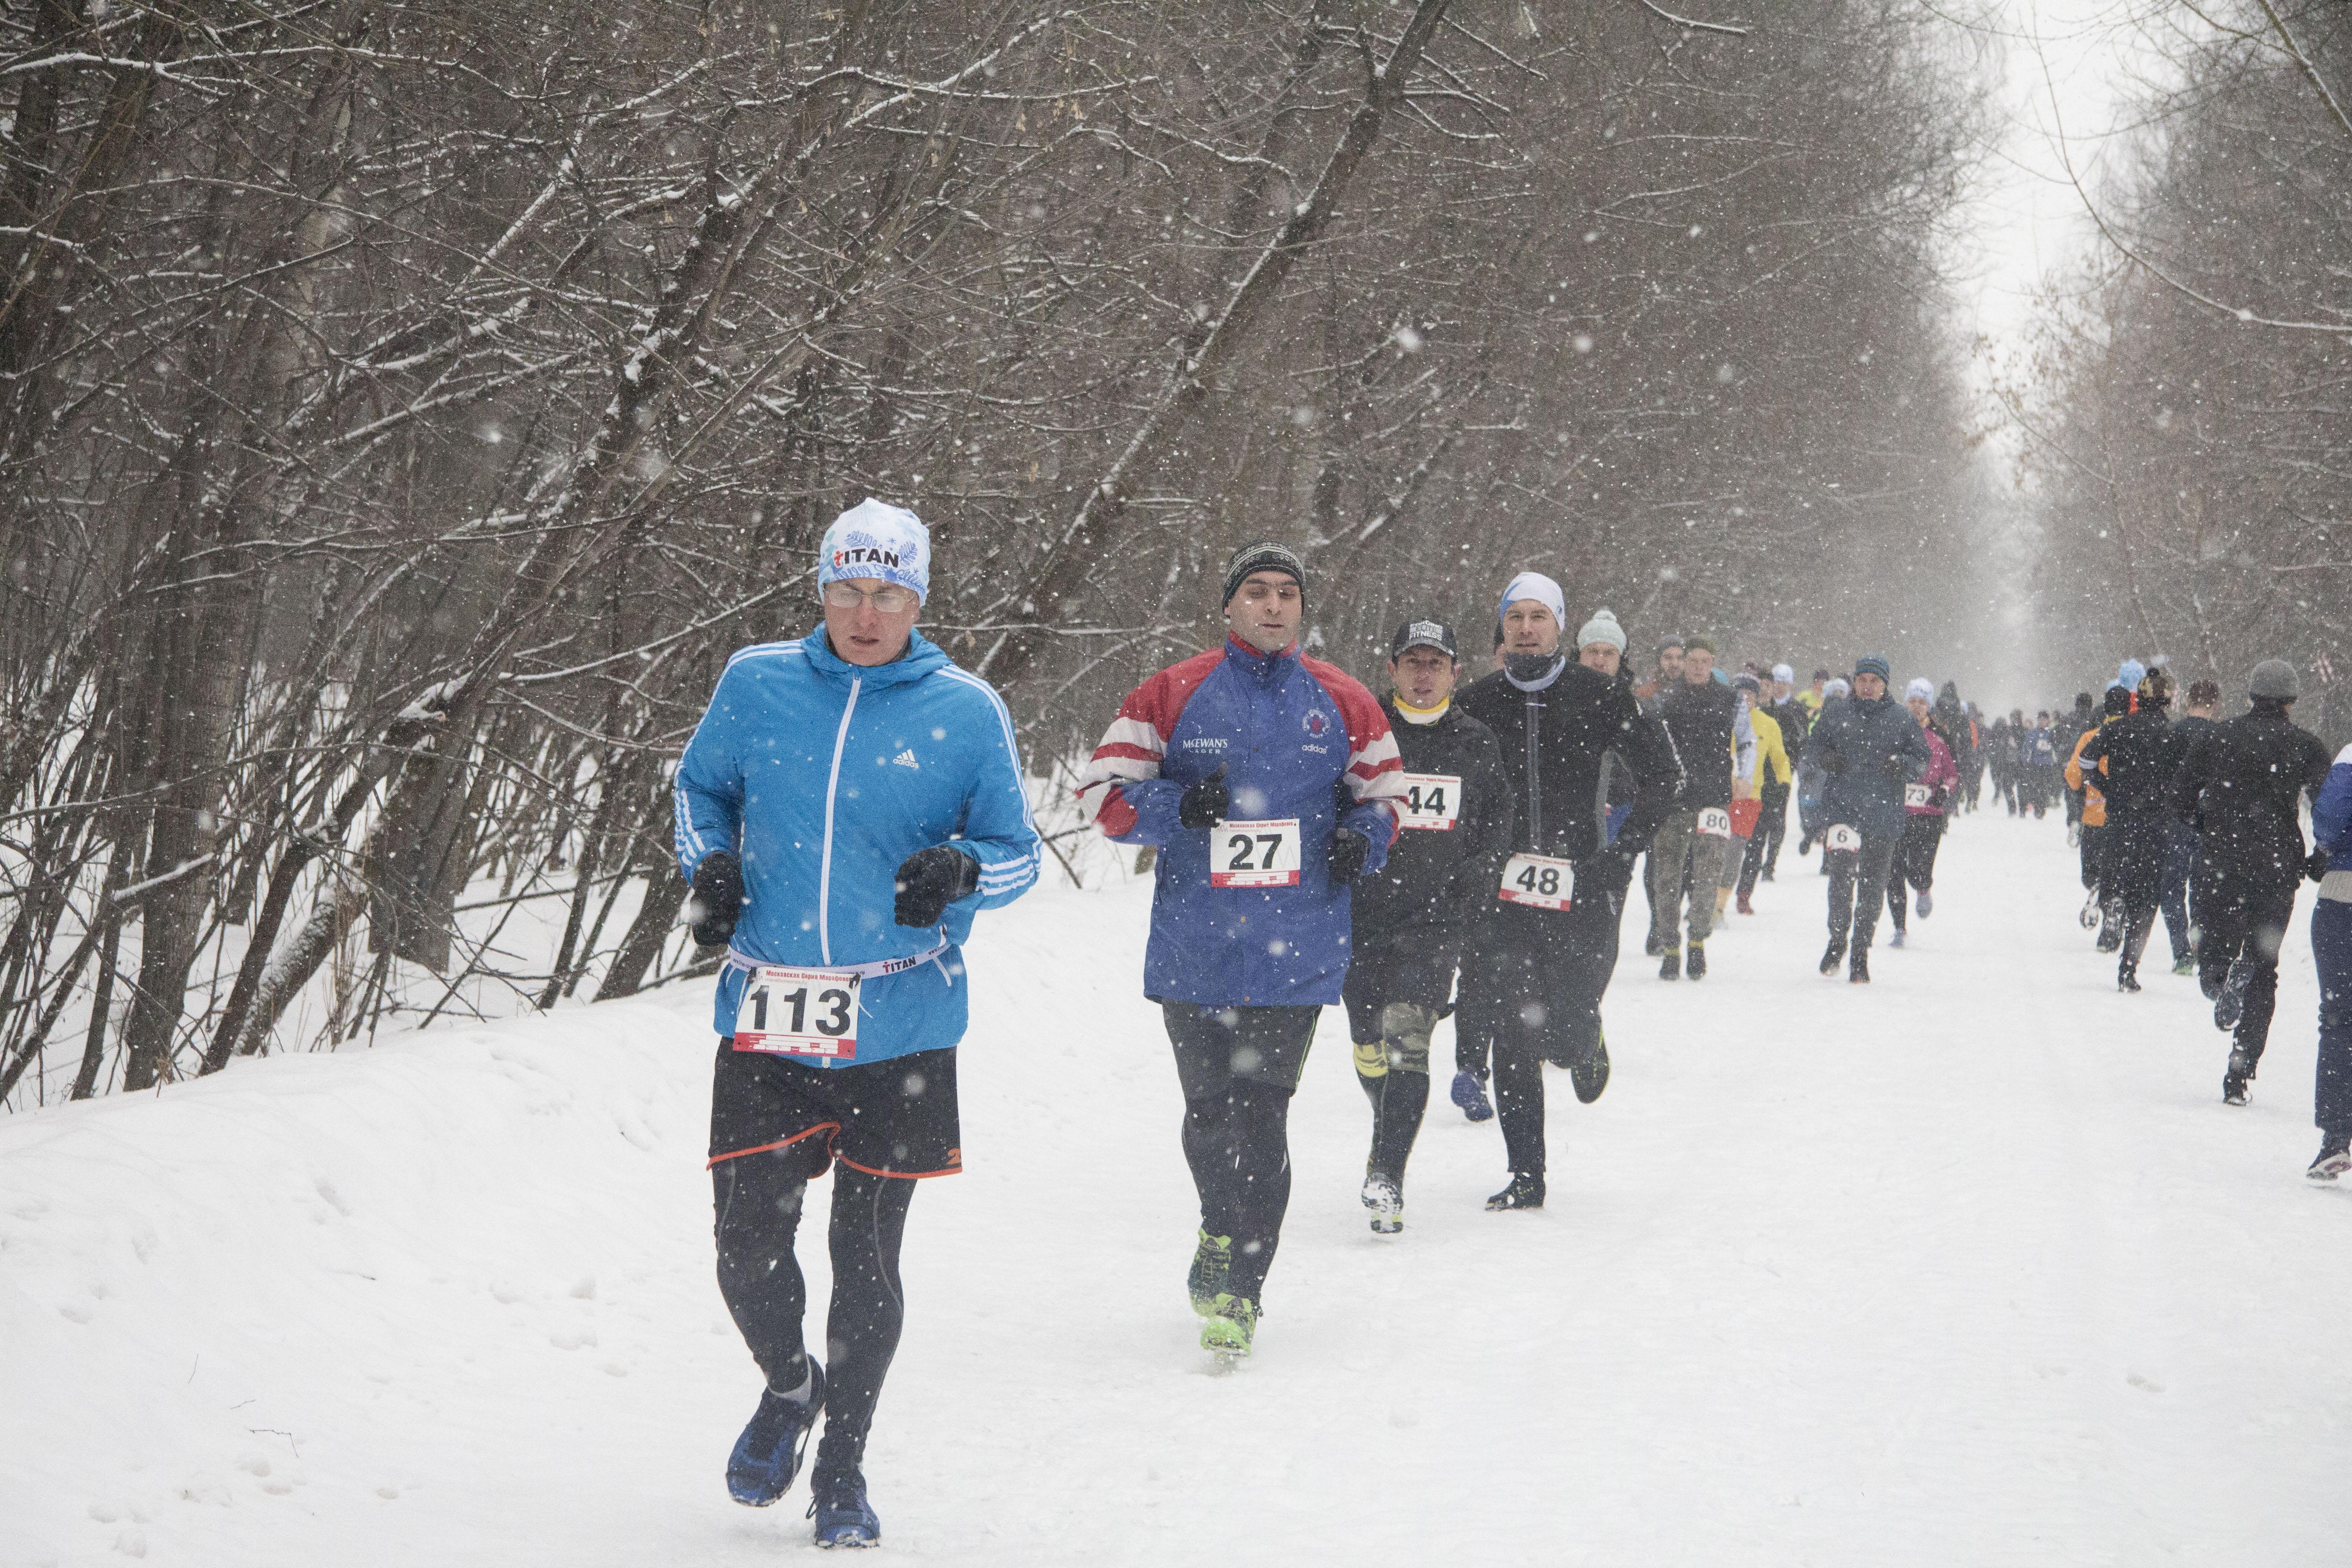 File:Moscow Marathon 21.jpg Wikimedia Commons